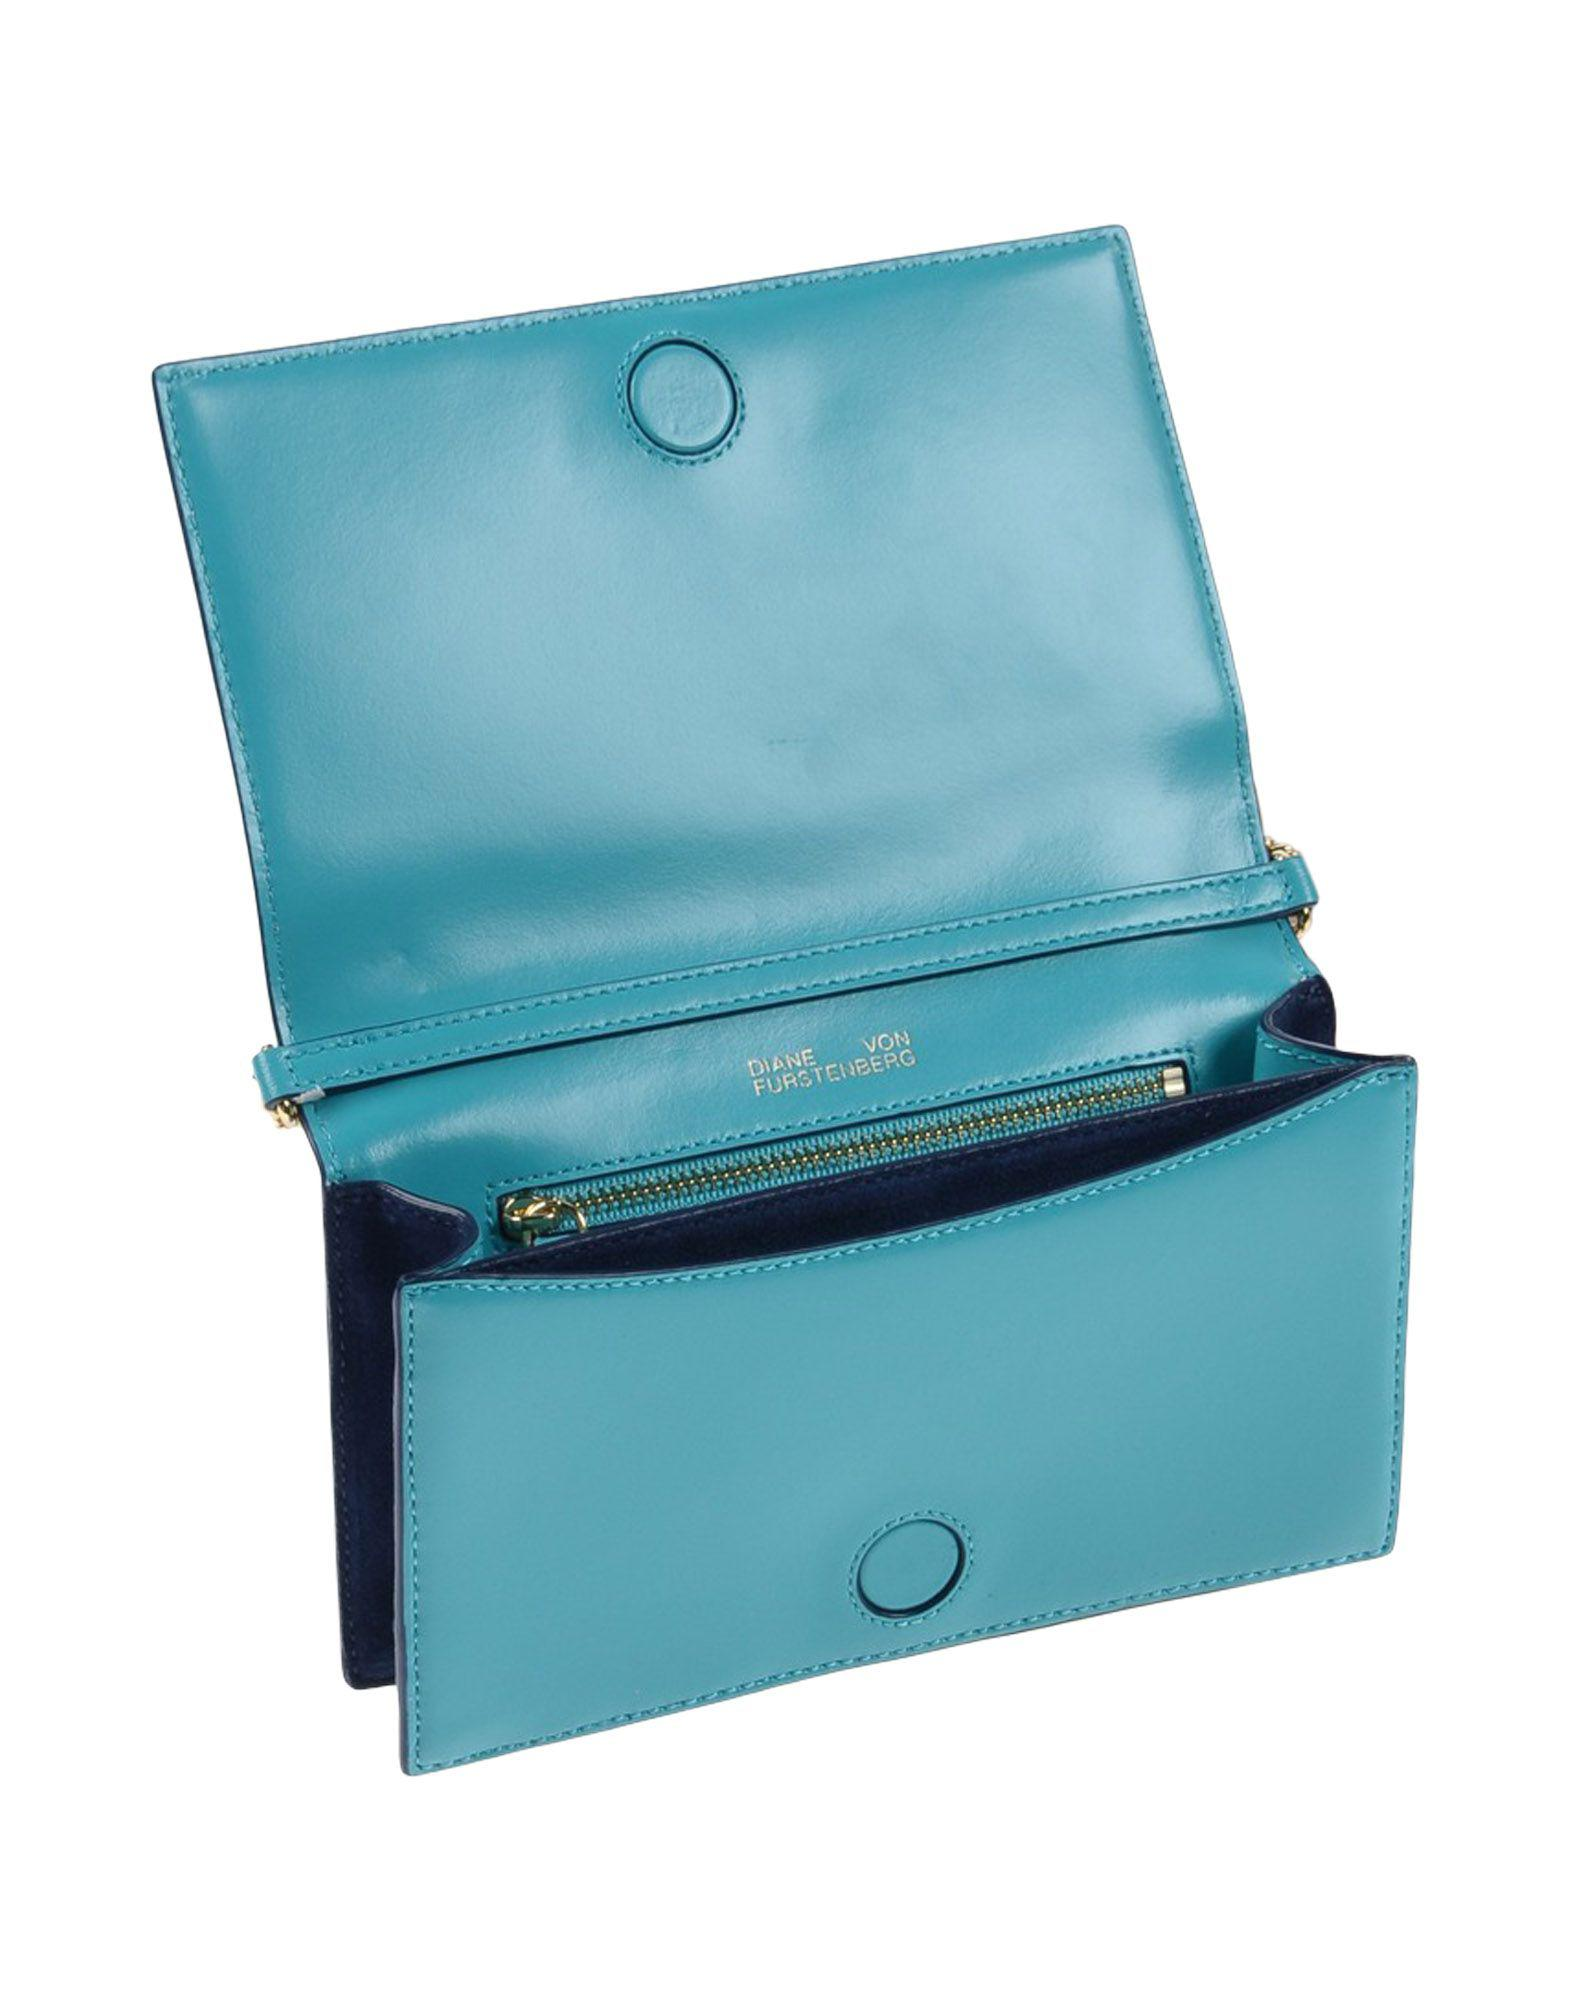 Diane von Furstenberg Leather Cross-body Bag in Turquoise (Blue)